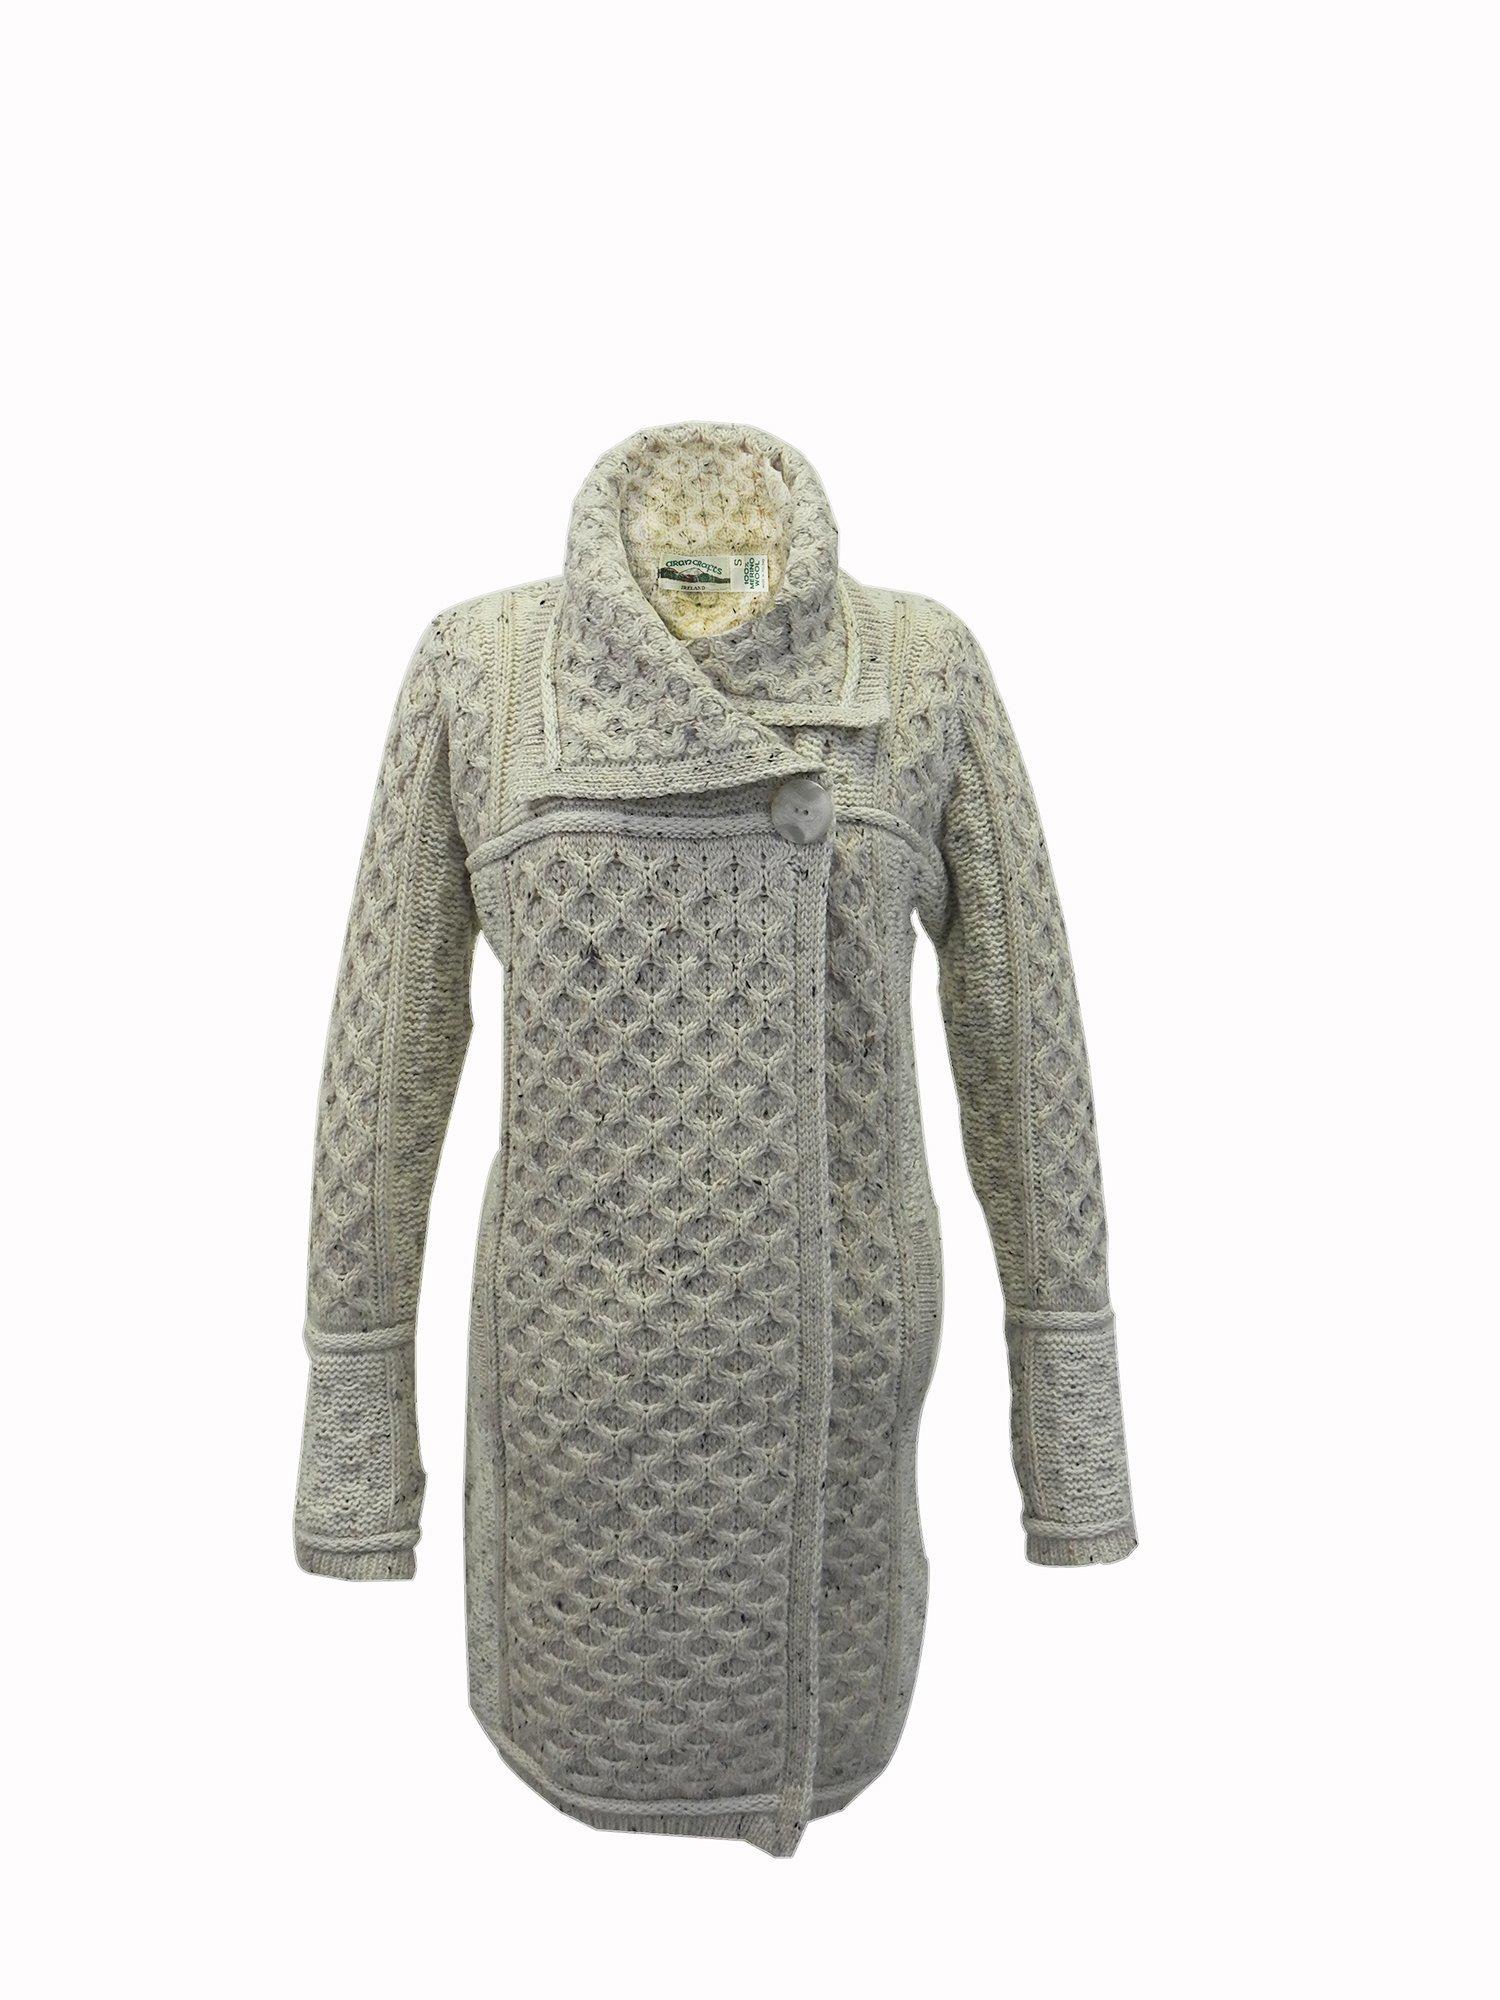 Irish Merino Wool Single Button Plated Coat (Small, Oatmeal)